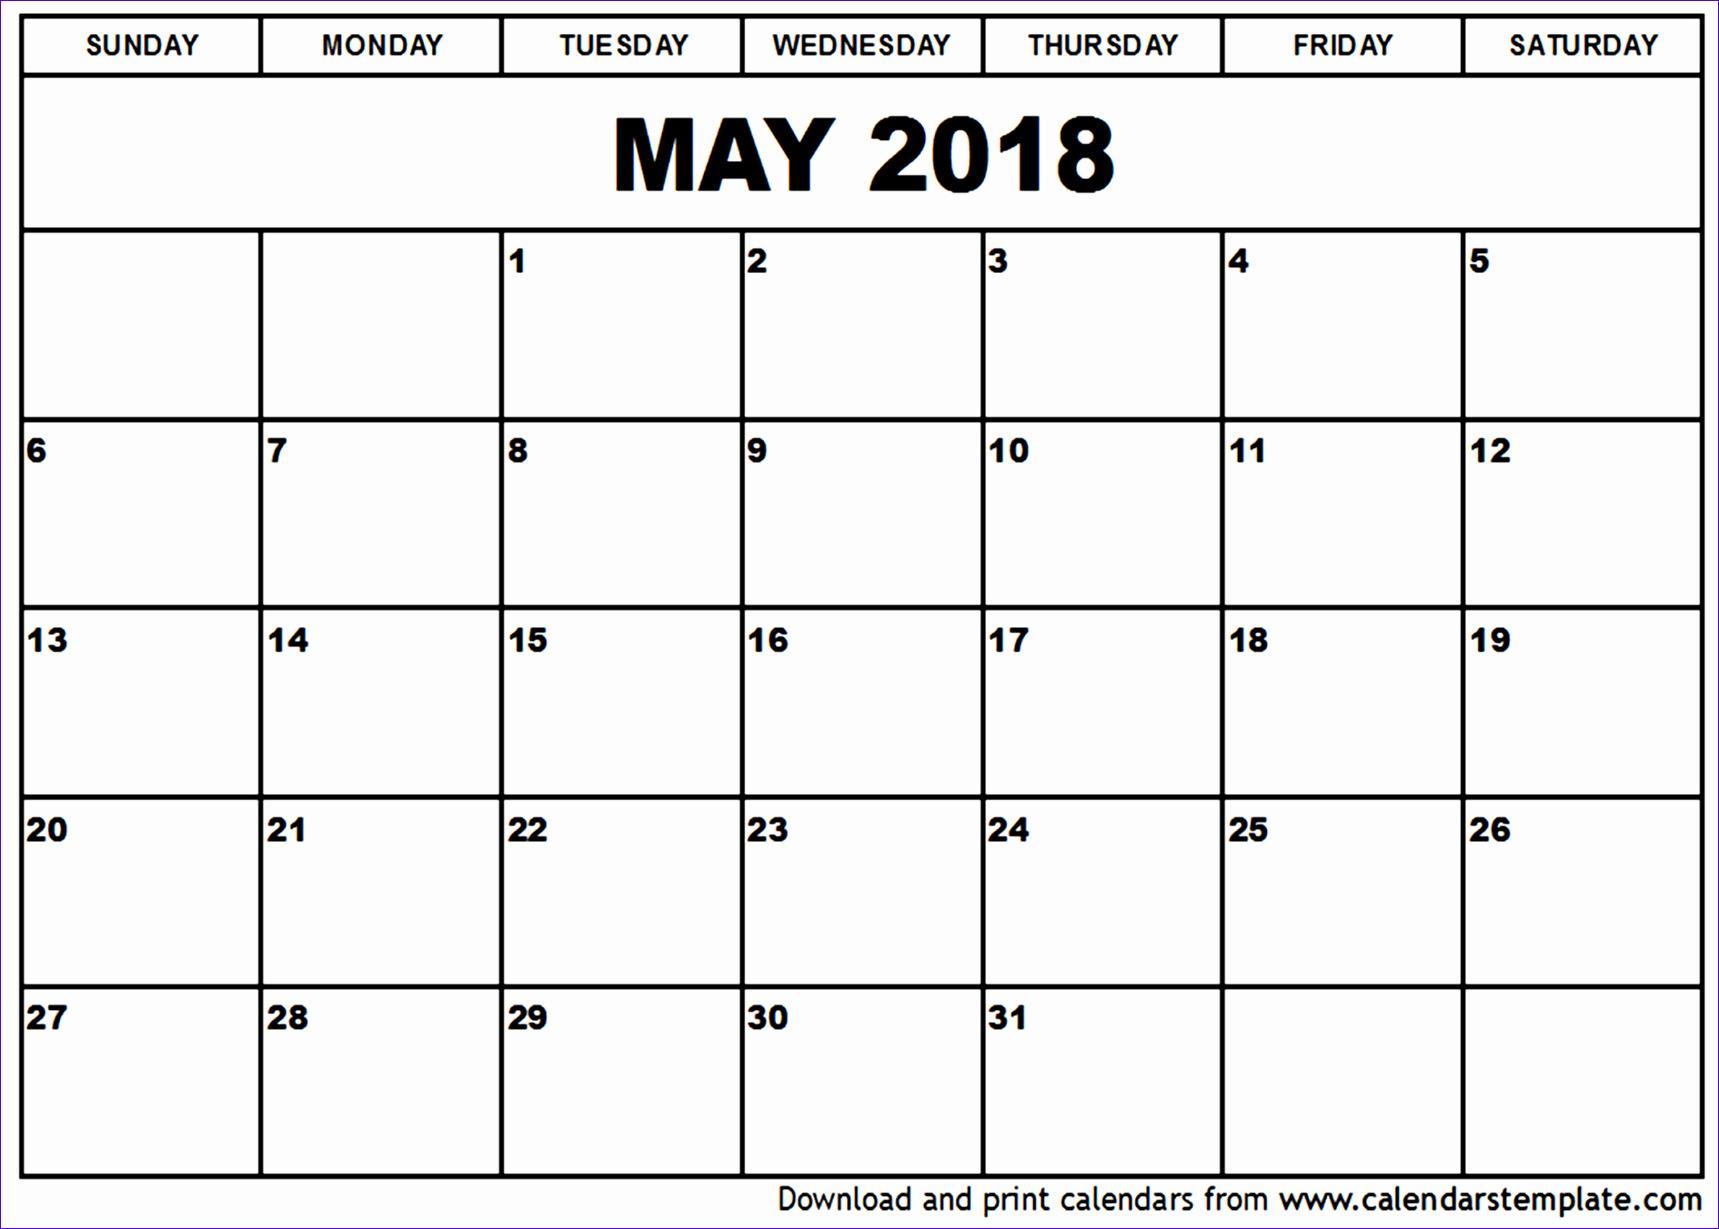 10 Free Calendar Templates Excel - Excel Templates